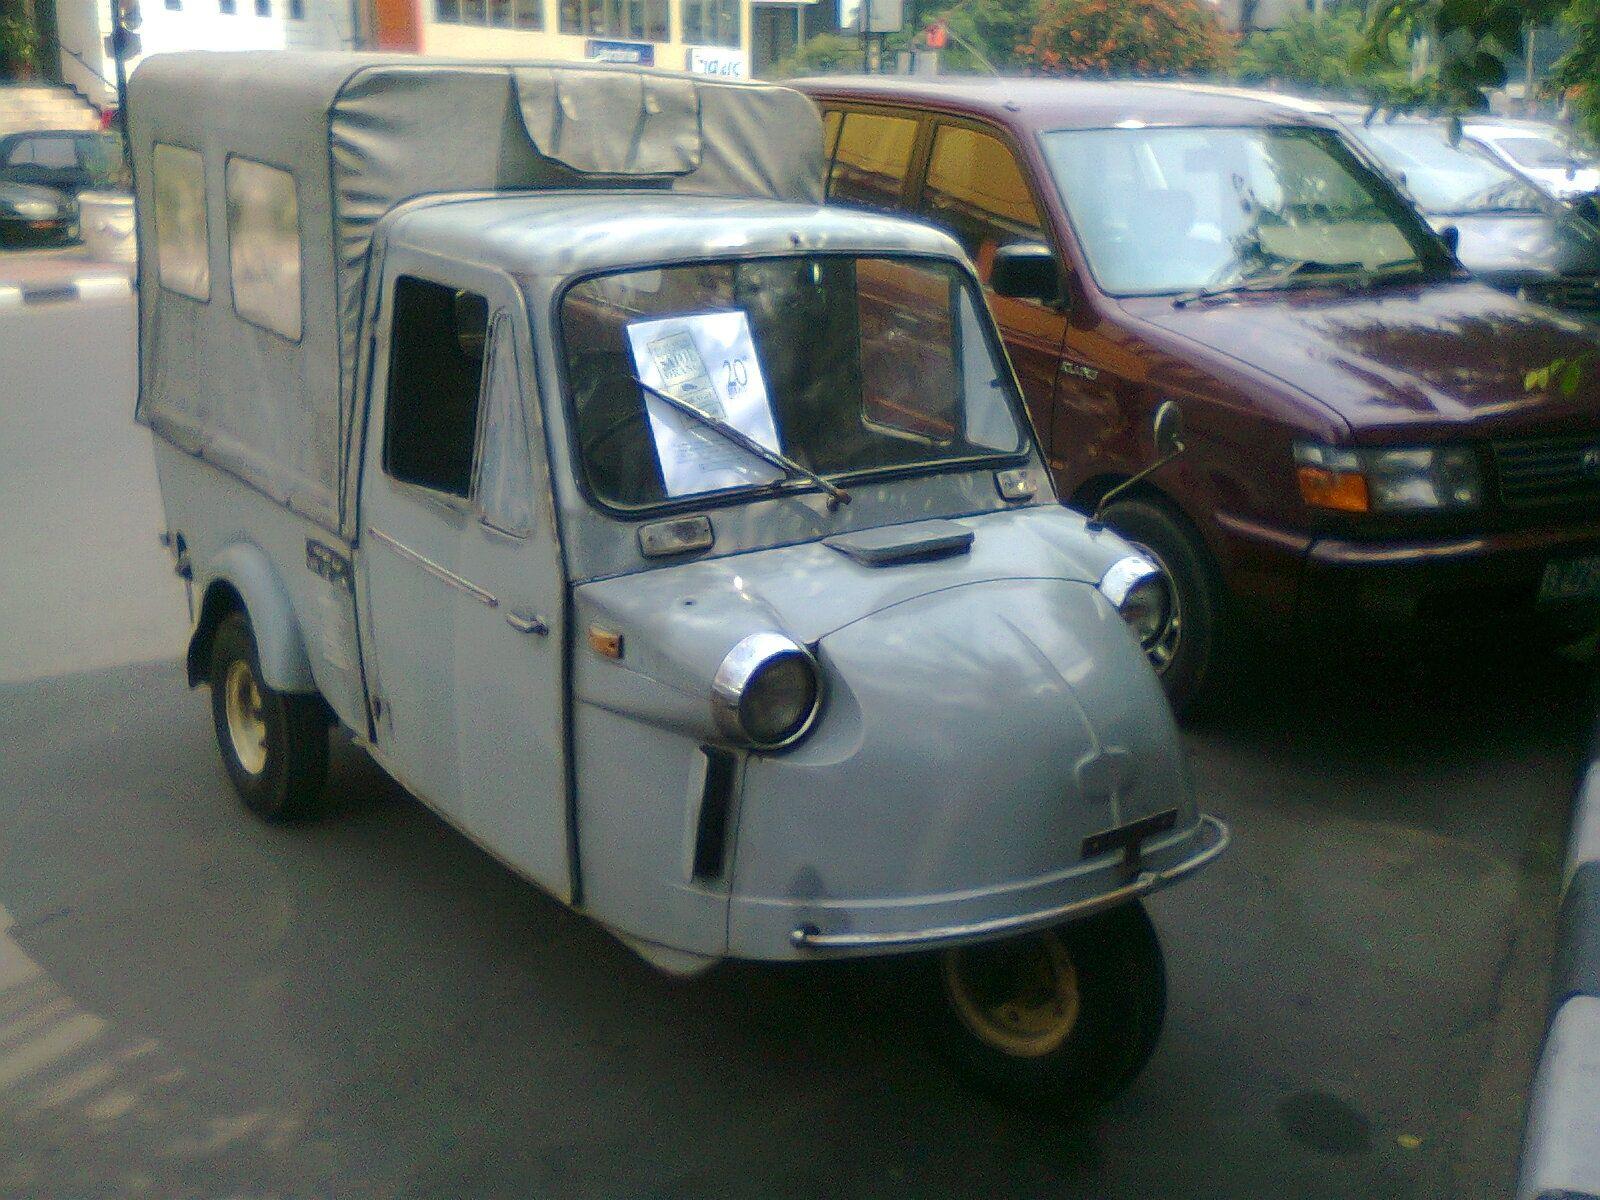 Tiny Trucks Bemo Pick Up Bemo Project Pinterest Transportation And Cars